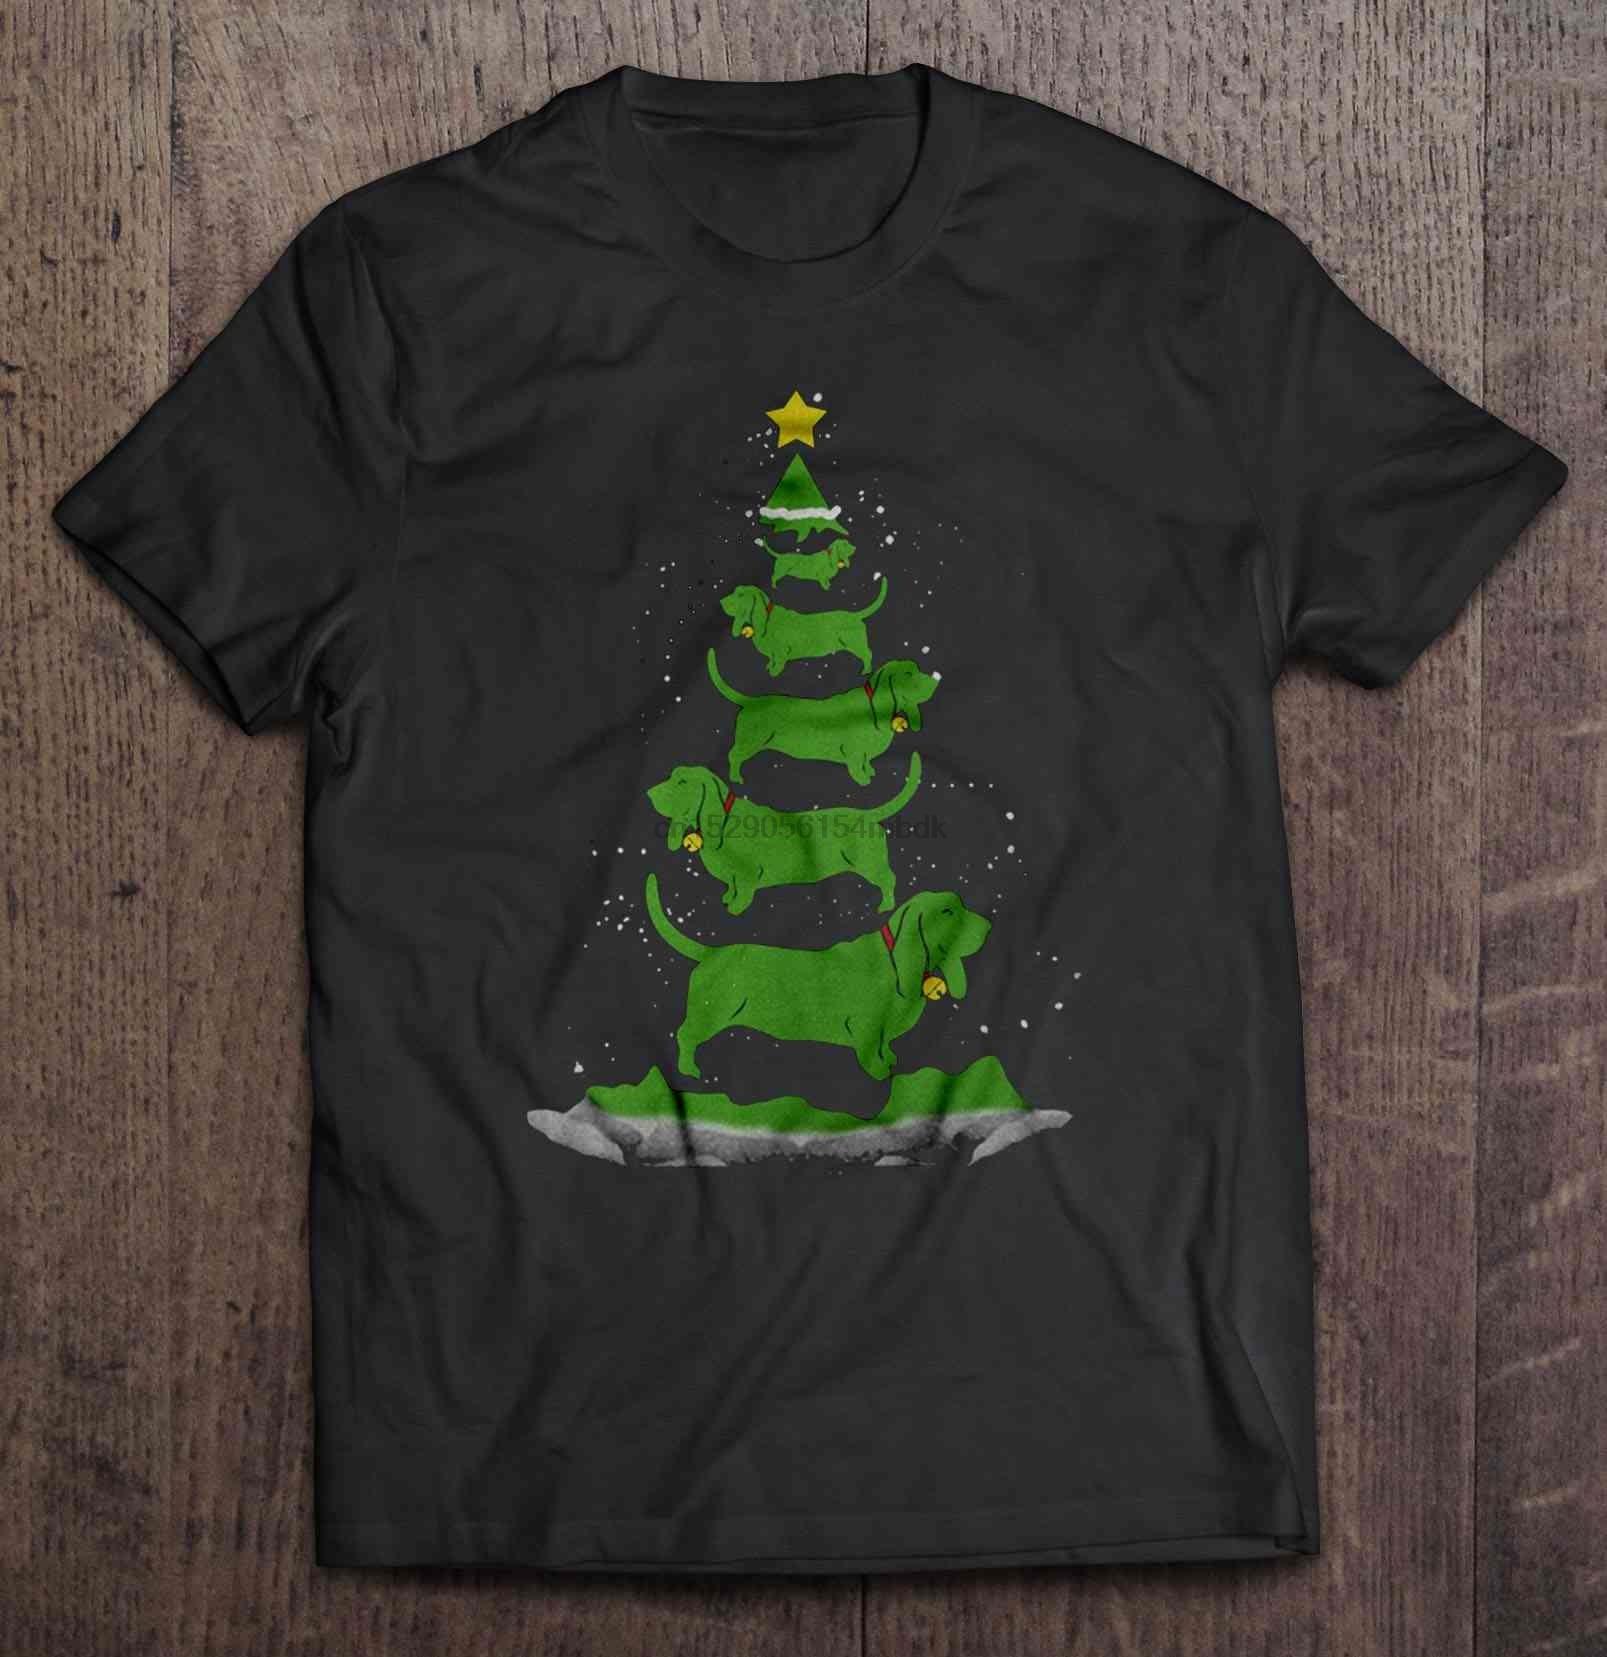 Camiseta Basset para hombre, suéter de árbol de Navidad, suéter de Navidad para mujer